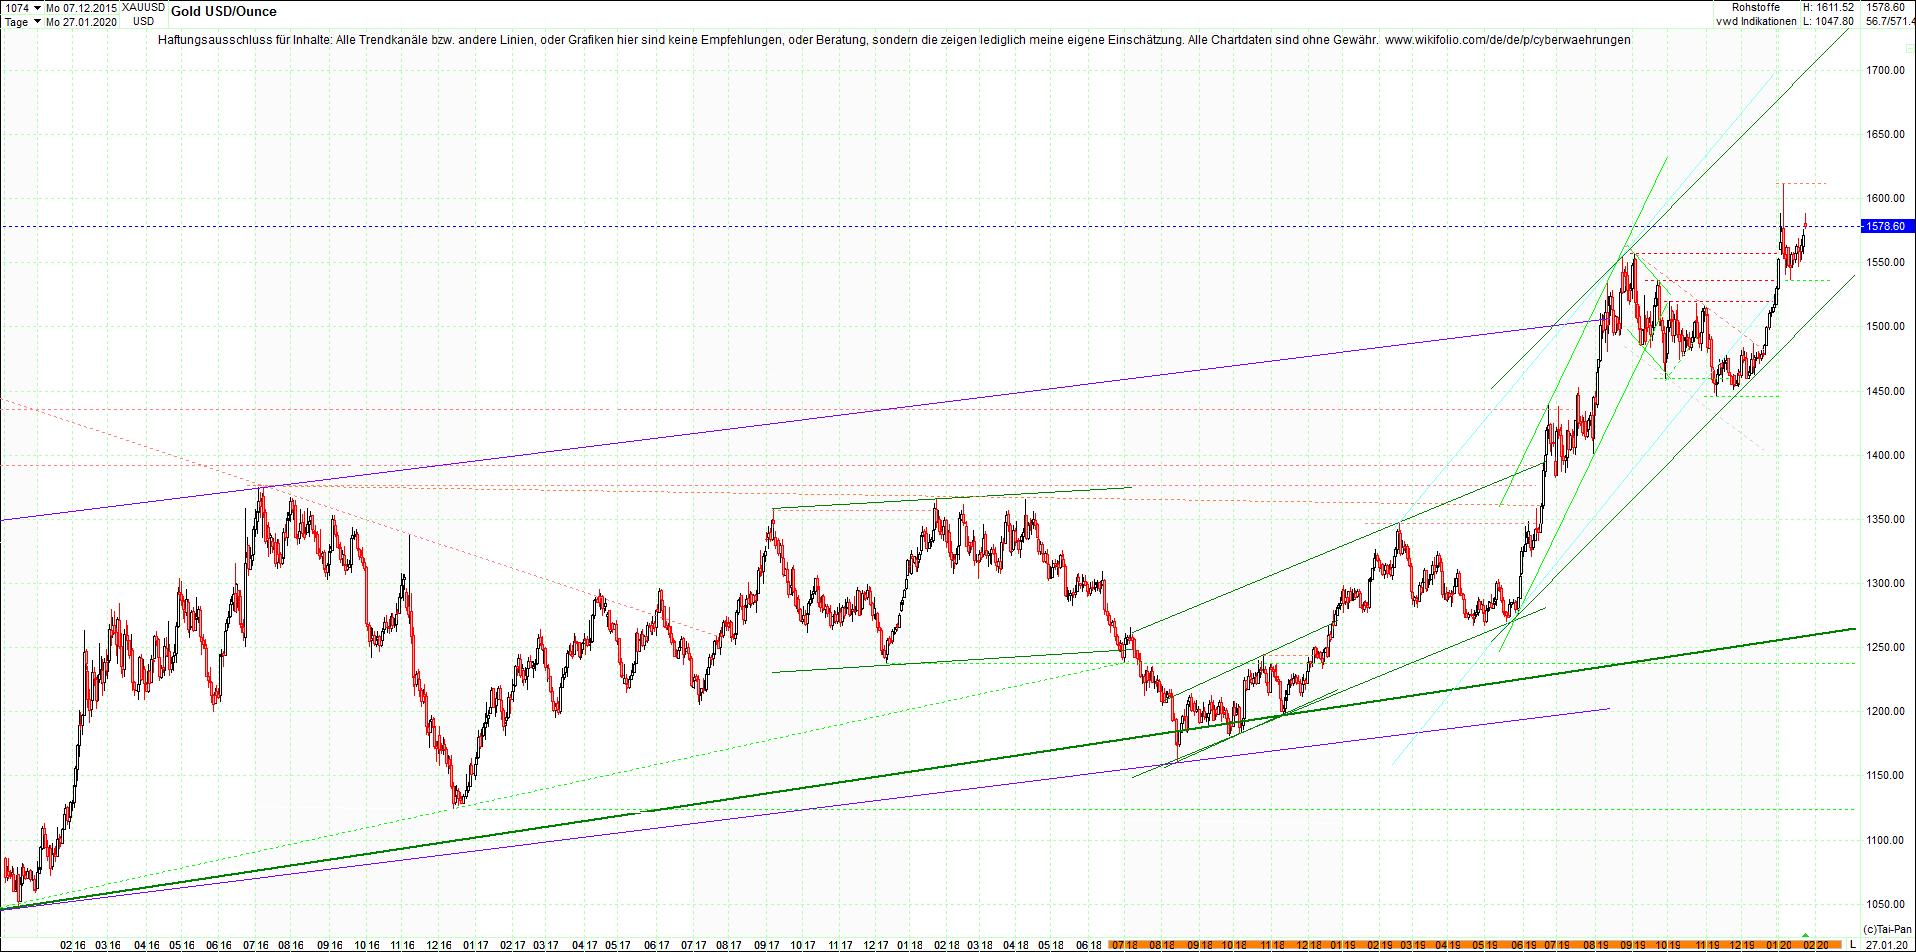 gold_chart_heute_abend.png